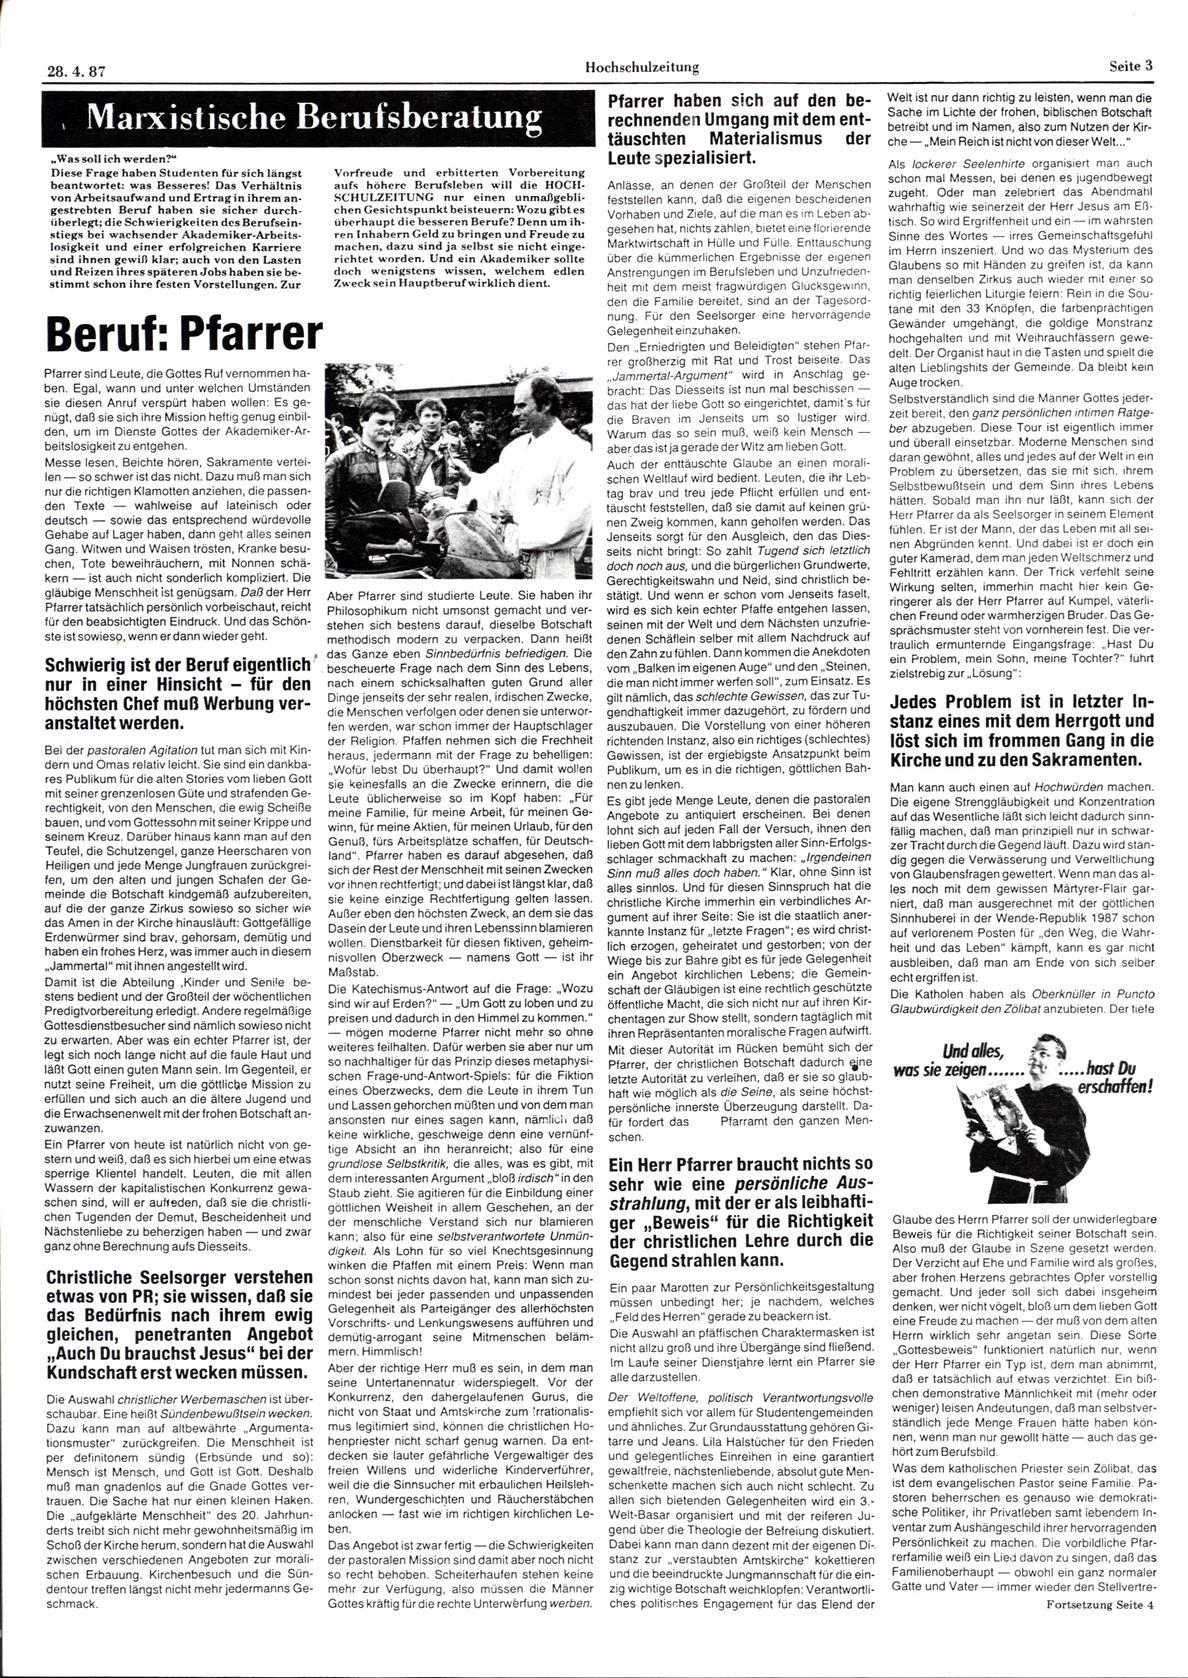 Bochum_BHZ_19870428_147_003